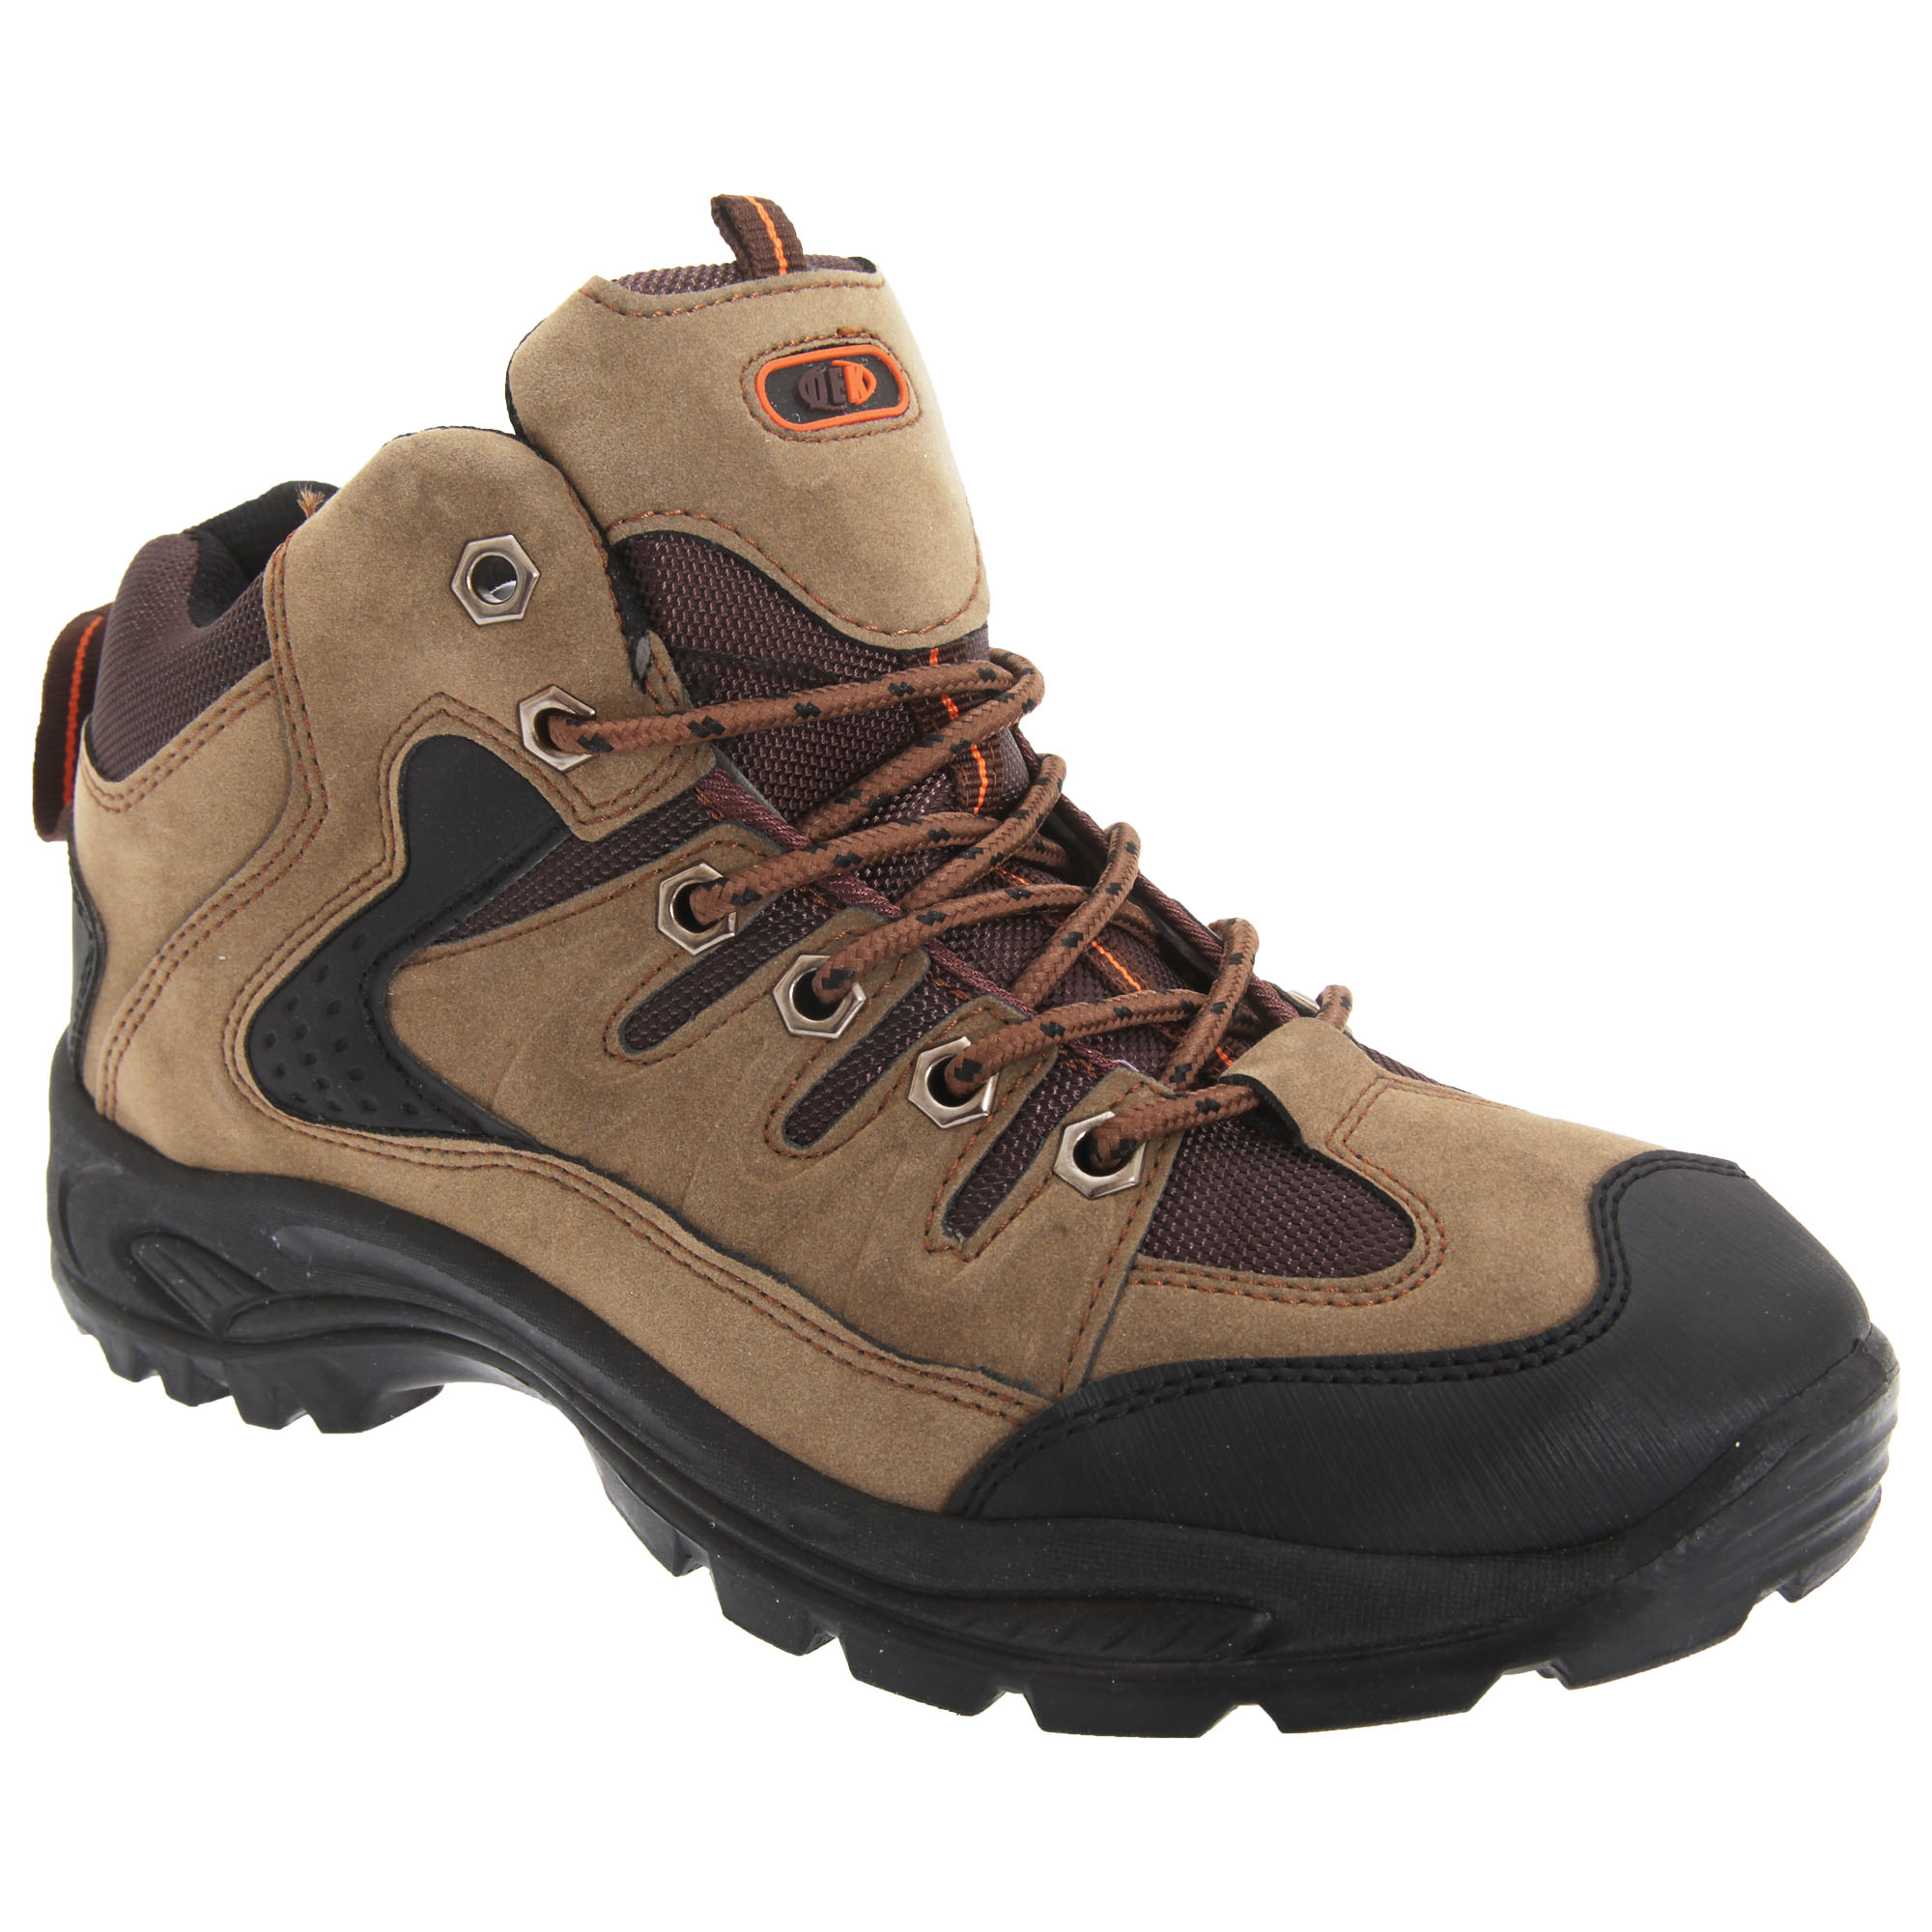 Dek Mens Ontario Lace-Up Hiking Trail Boots (13 UK) (Khaki)